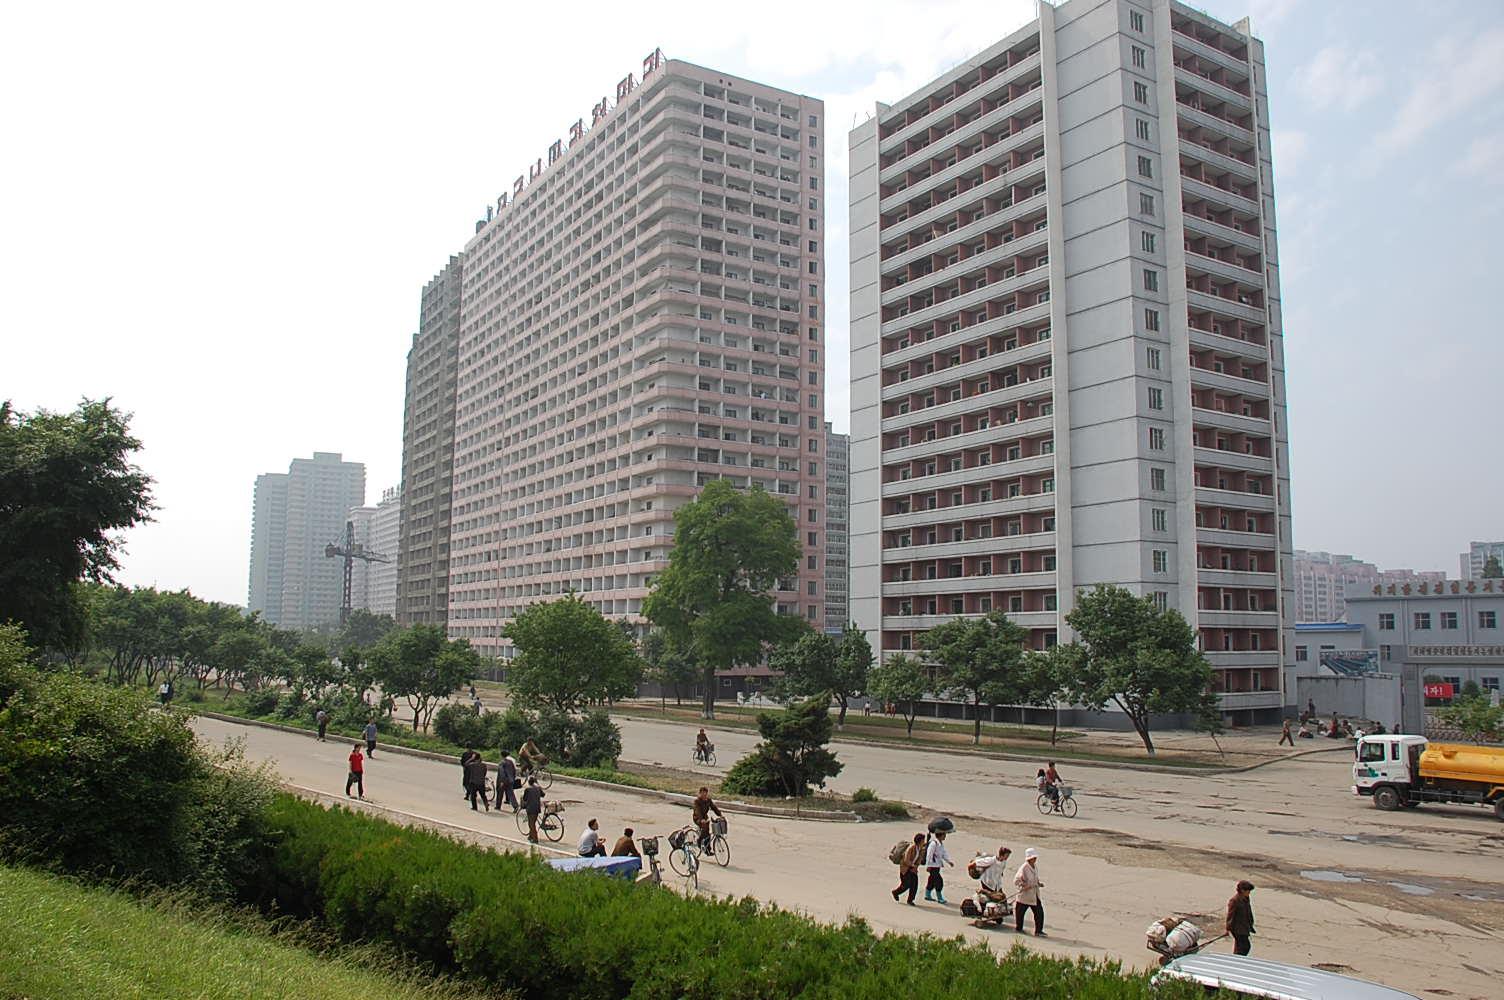 File:North Korea-Pyongyang-Buildings and passengers-01.jpg - Wikimedia  Commons